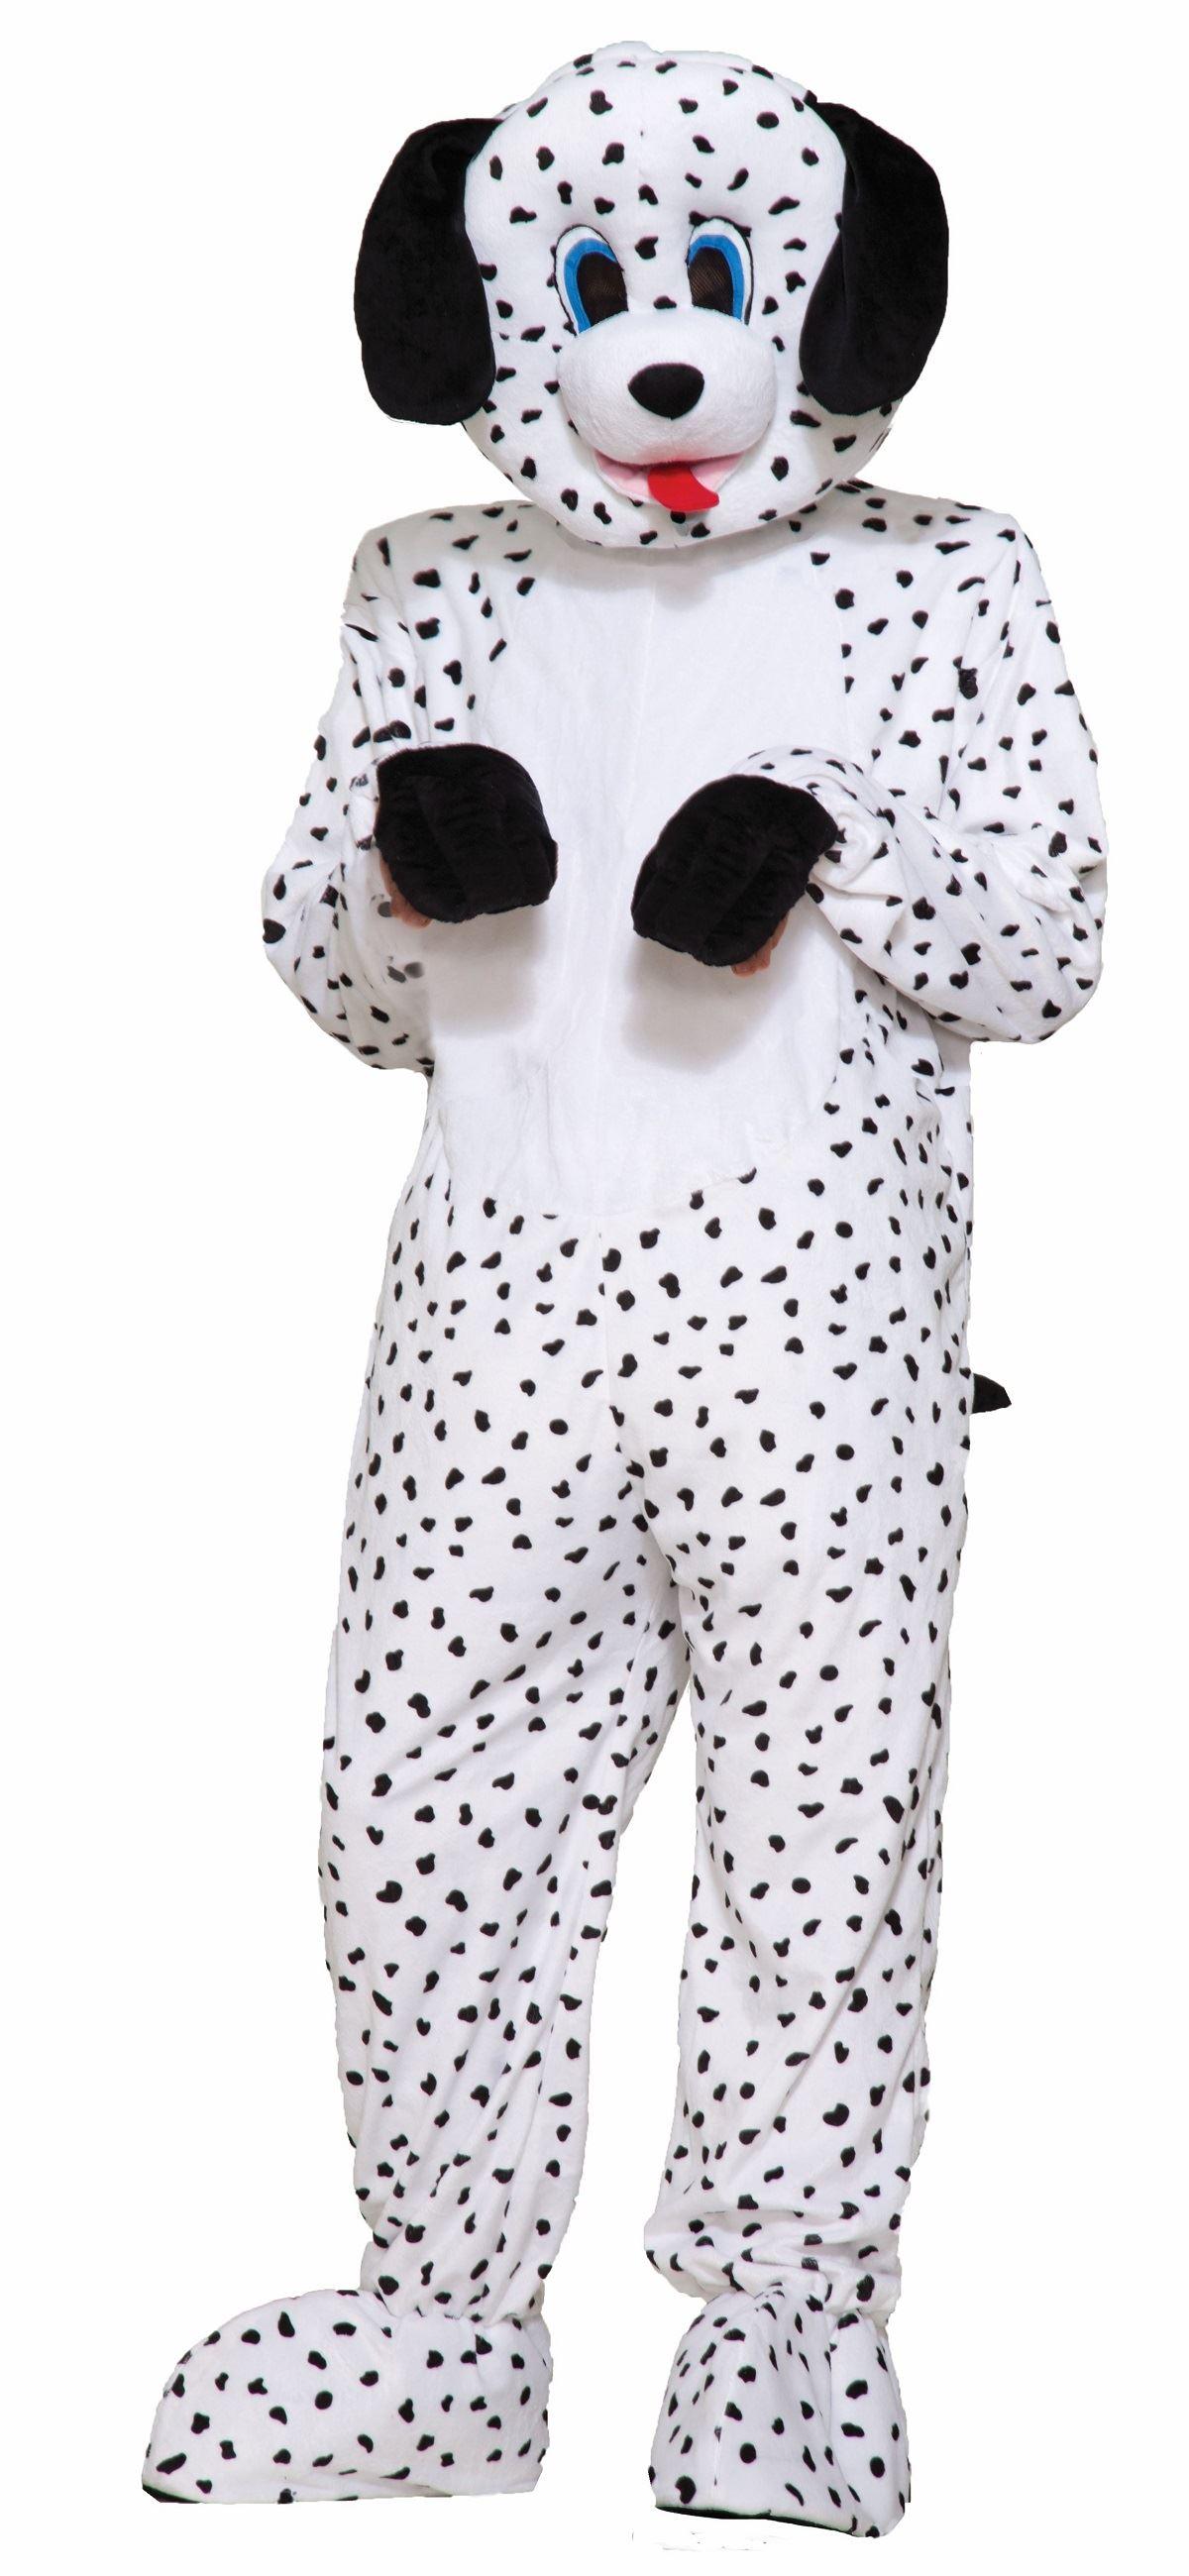 Adult Dalmatian Mascot Costume ...  sc 1 st  The Costume Land & Adult Dalmatian Mascot Costume   $61.99   The Costume Land